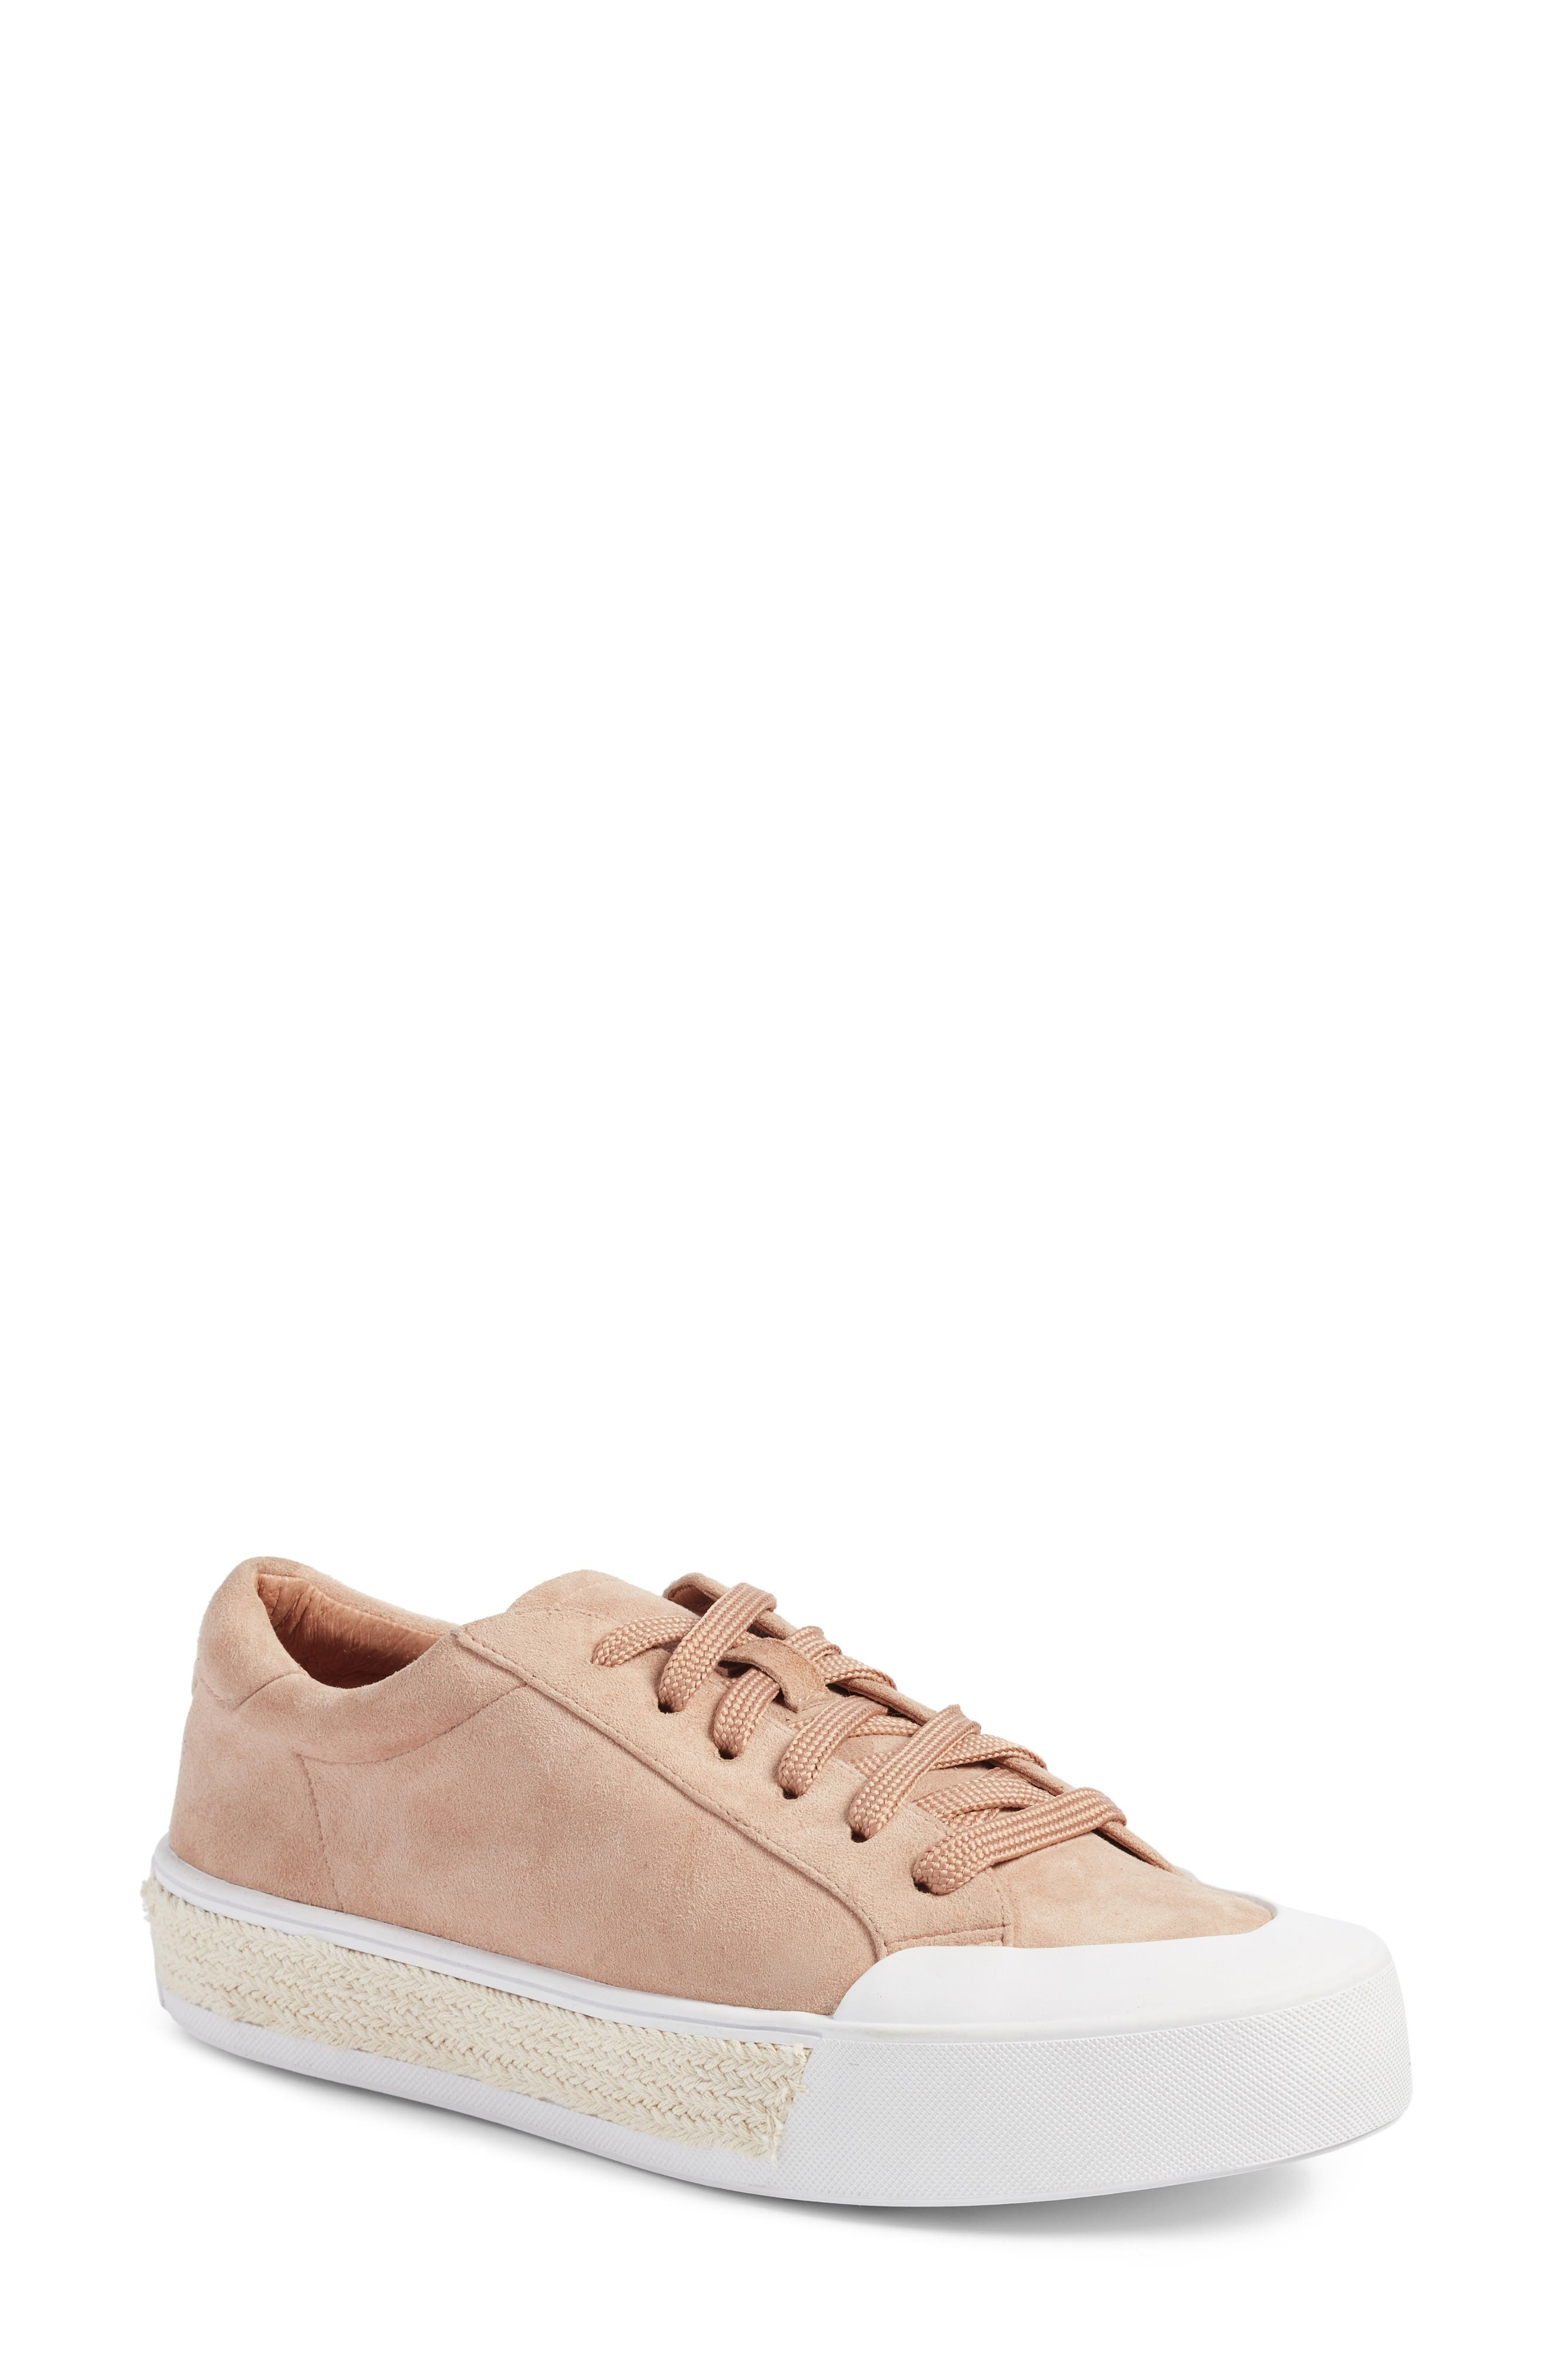 Toran Platform Sneaker,                             Main thumbnail 1, color,                             Blush Suede